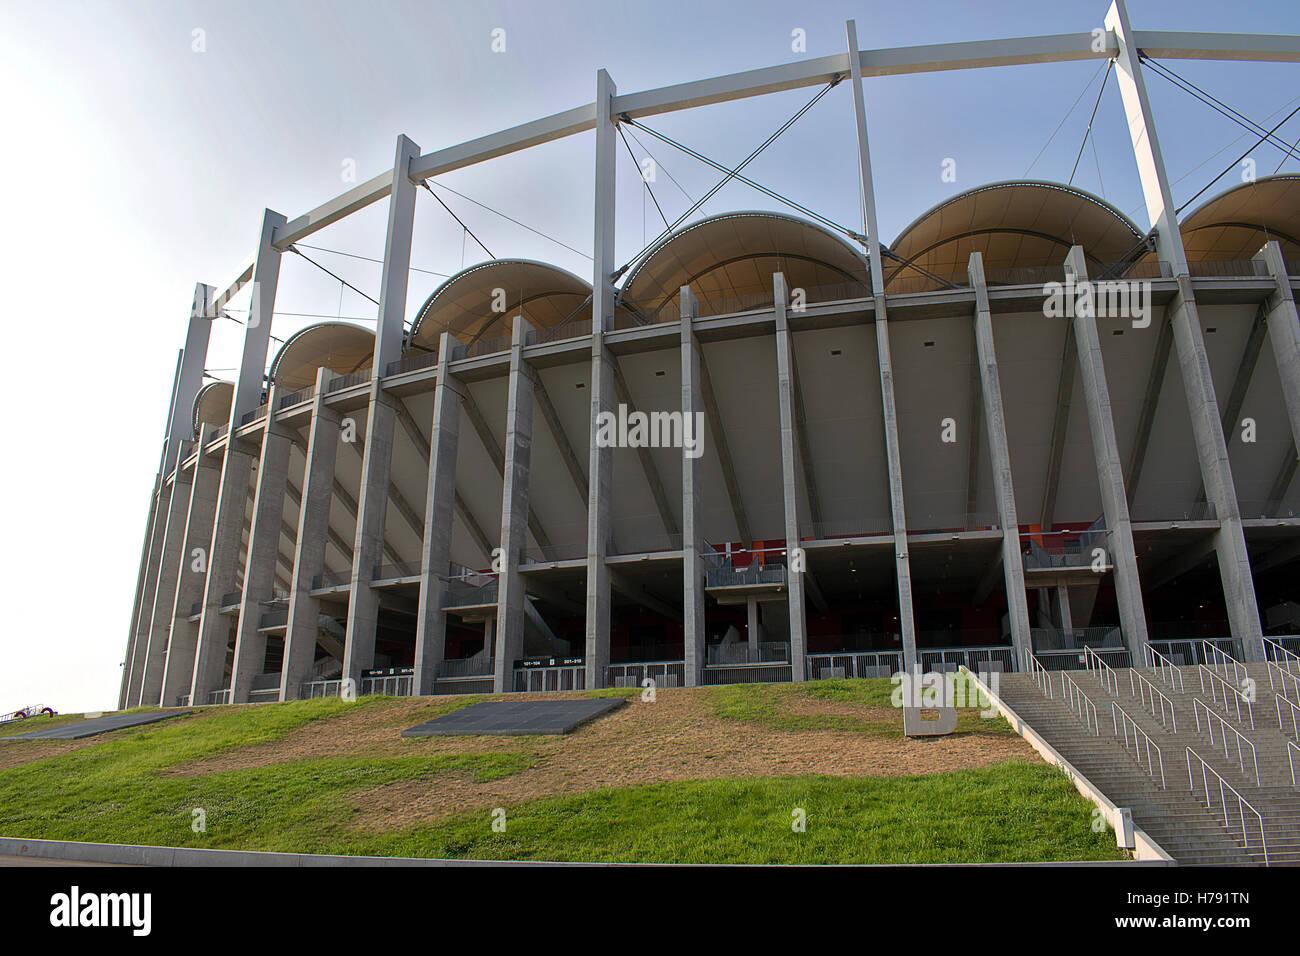 Stadium View - Stock Image